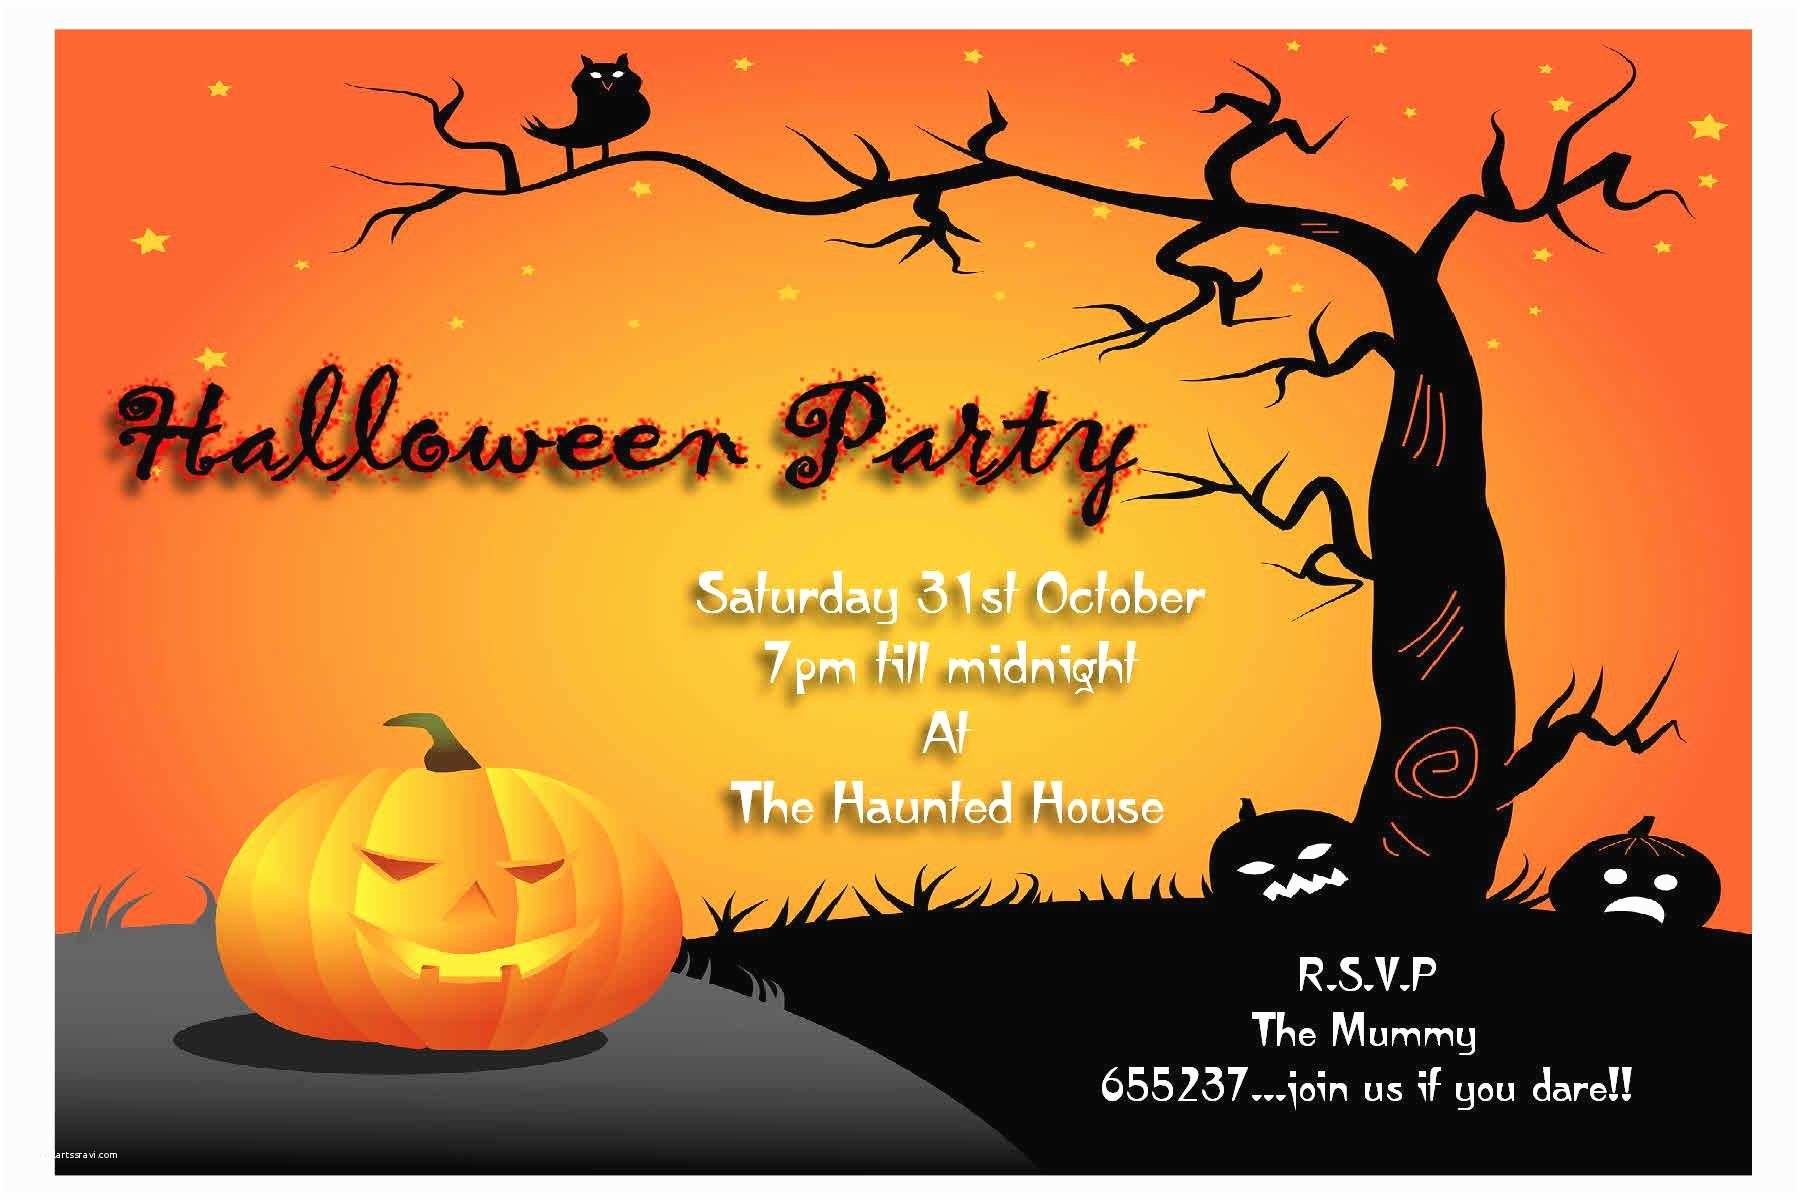 Halloween Party Invite Wording Halloween Party Invitation Wording